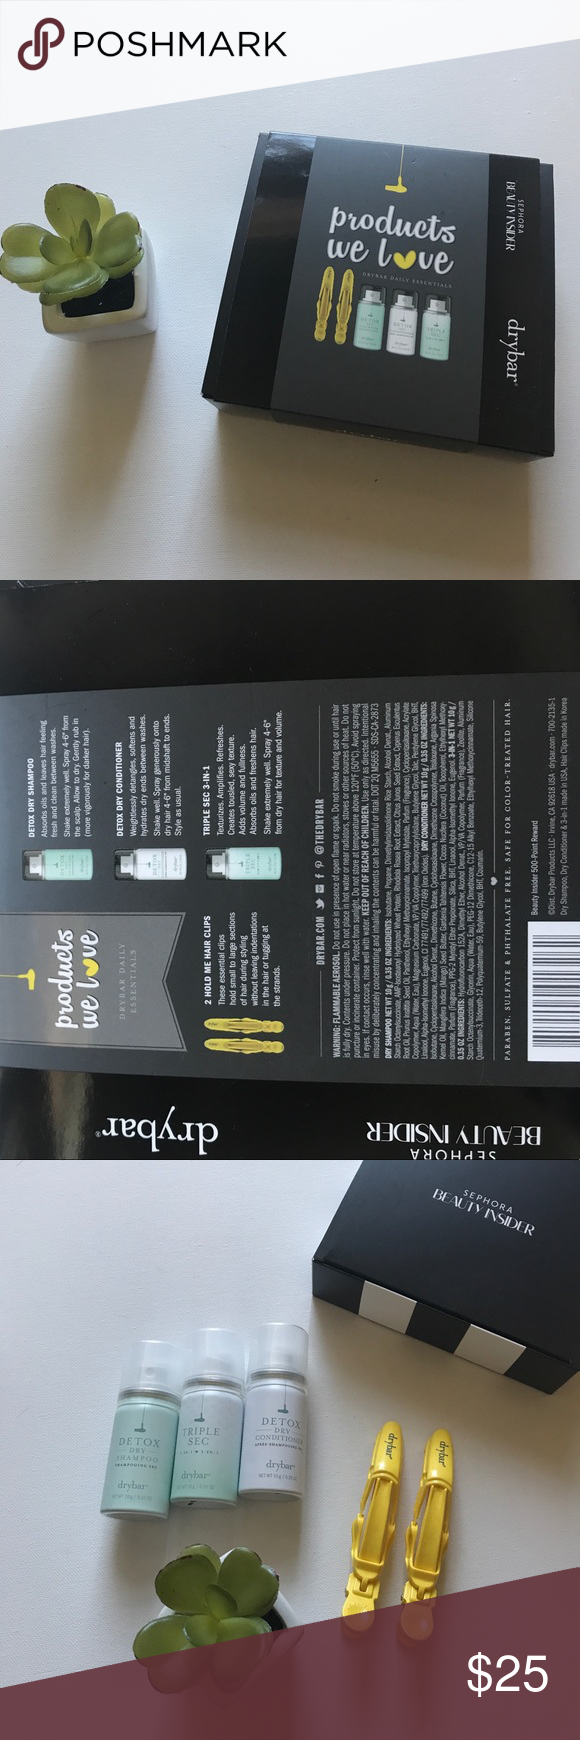 NWT Drybar Beauty Insider Box from Sephora Sephora Sephora makeup